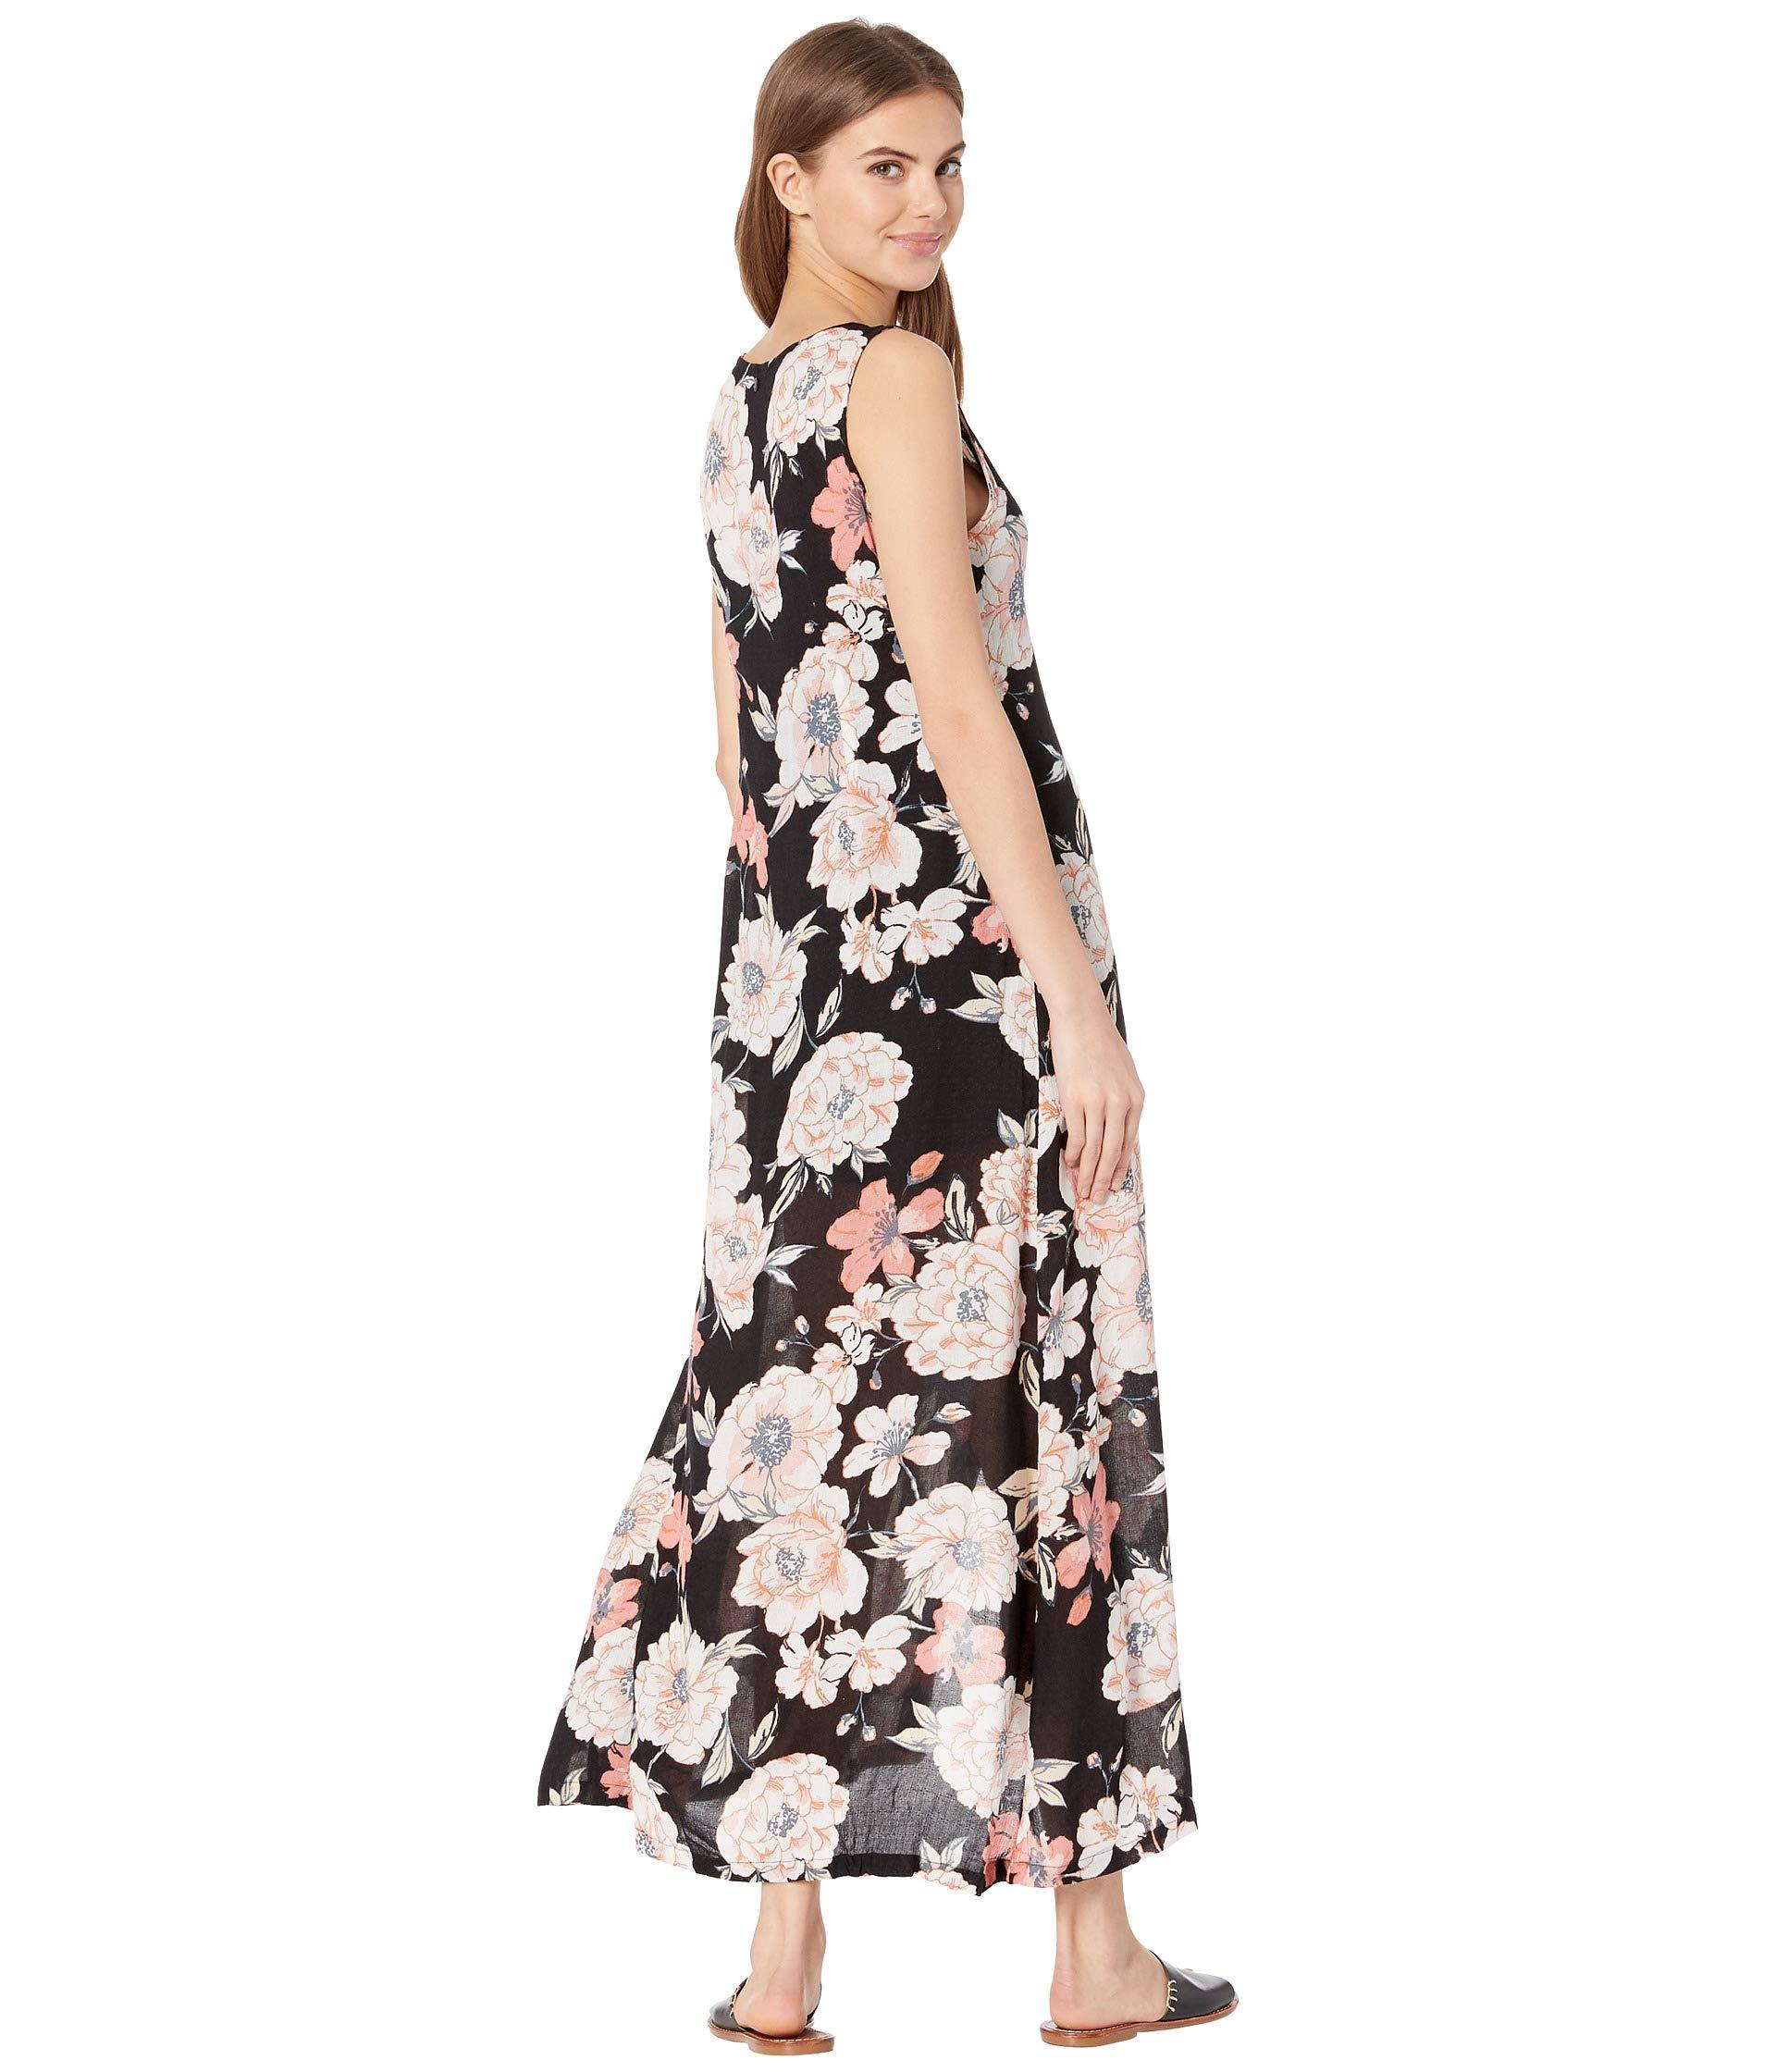 335001de0c9 Roxy - Multicolor Flowers Crown Maxi Overlay Romper (anthracite New Flowers)  Women s Dress -. View fullscreen